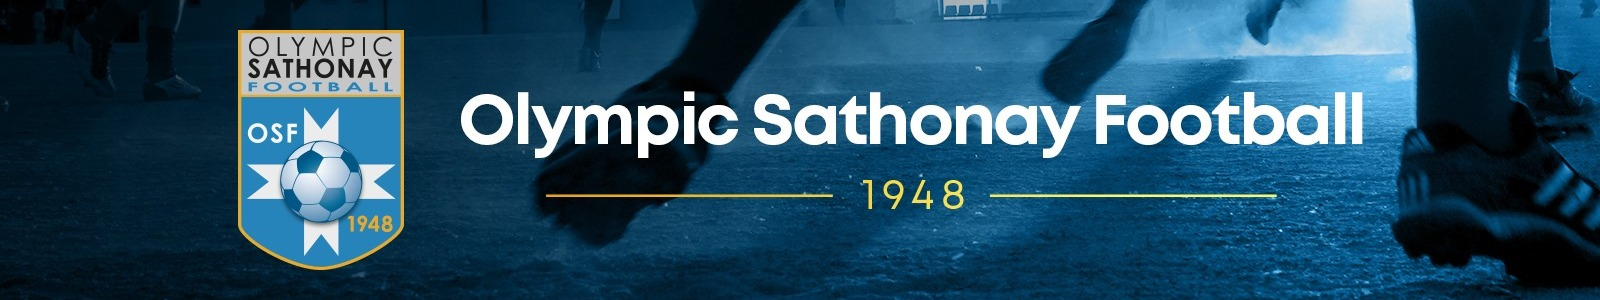 Olympic Sathonay Foot : site officiel du club de foot de SATHONAY CAMP - footeo